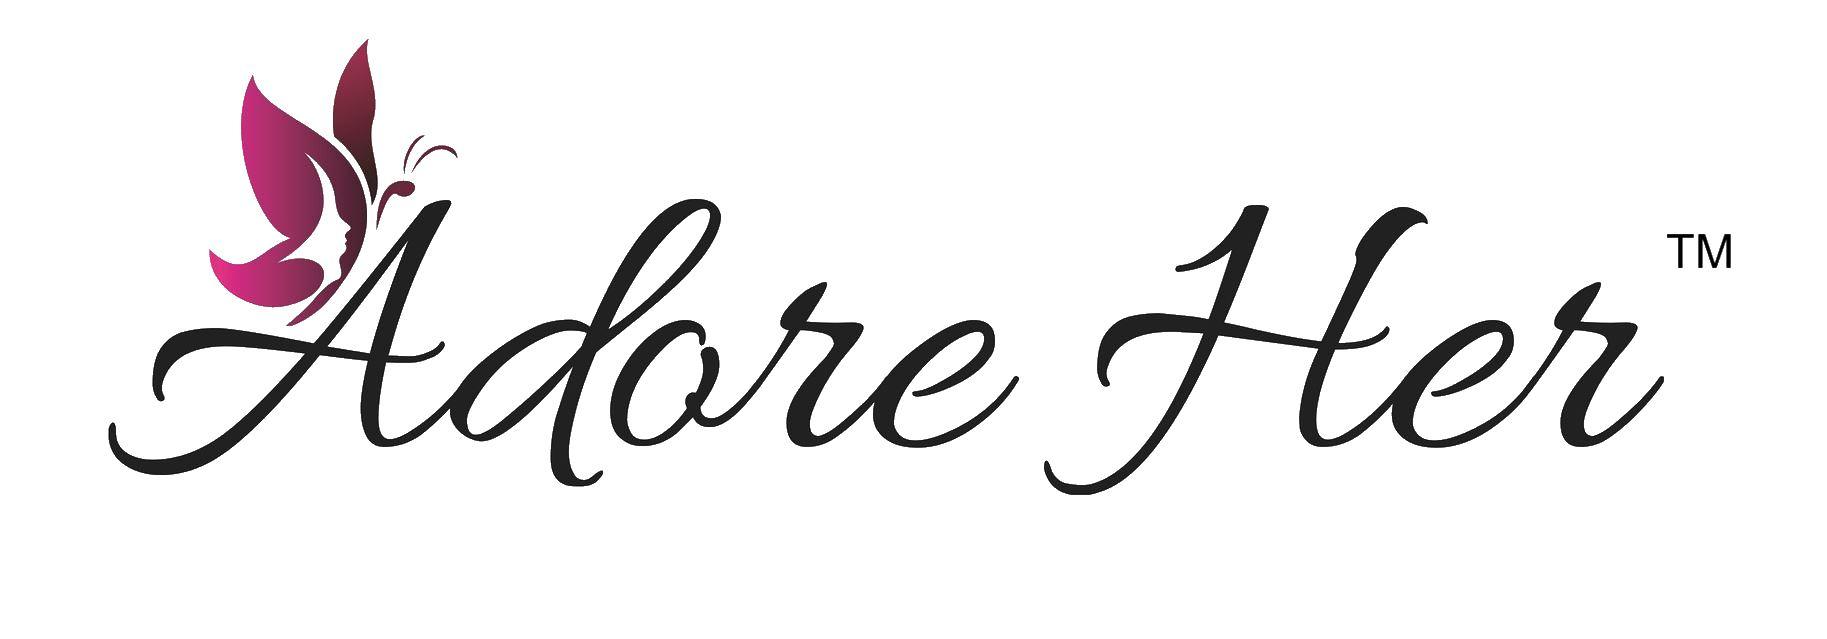 Adoringher.com Coupons & Promo codes